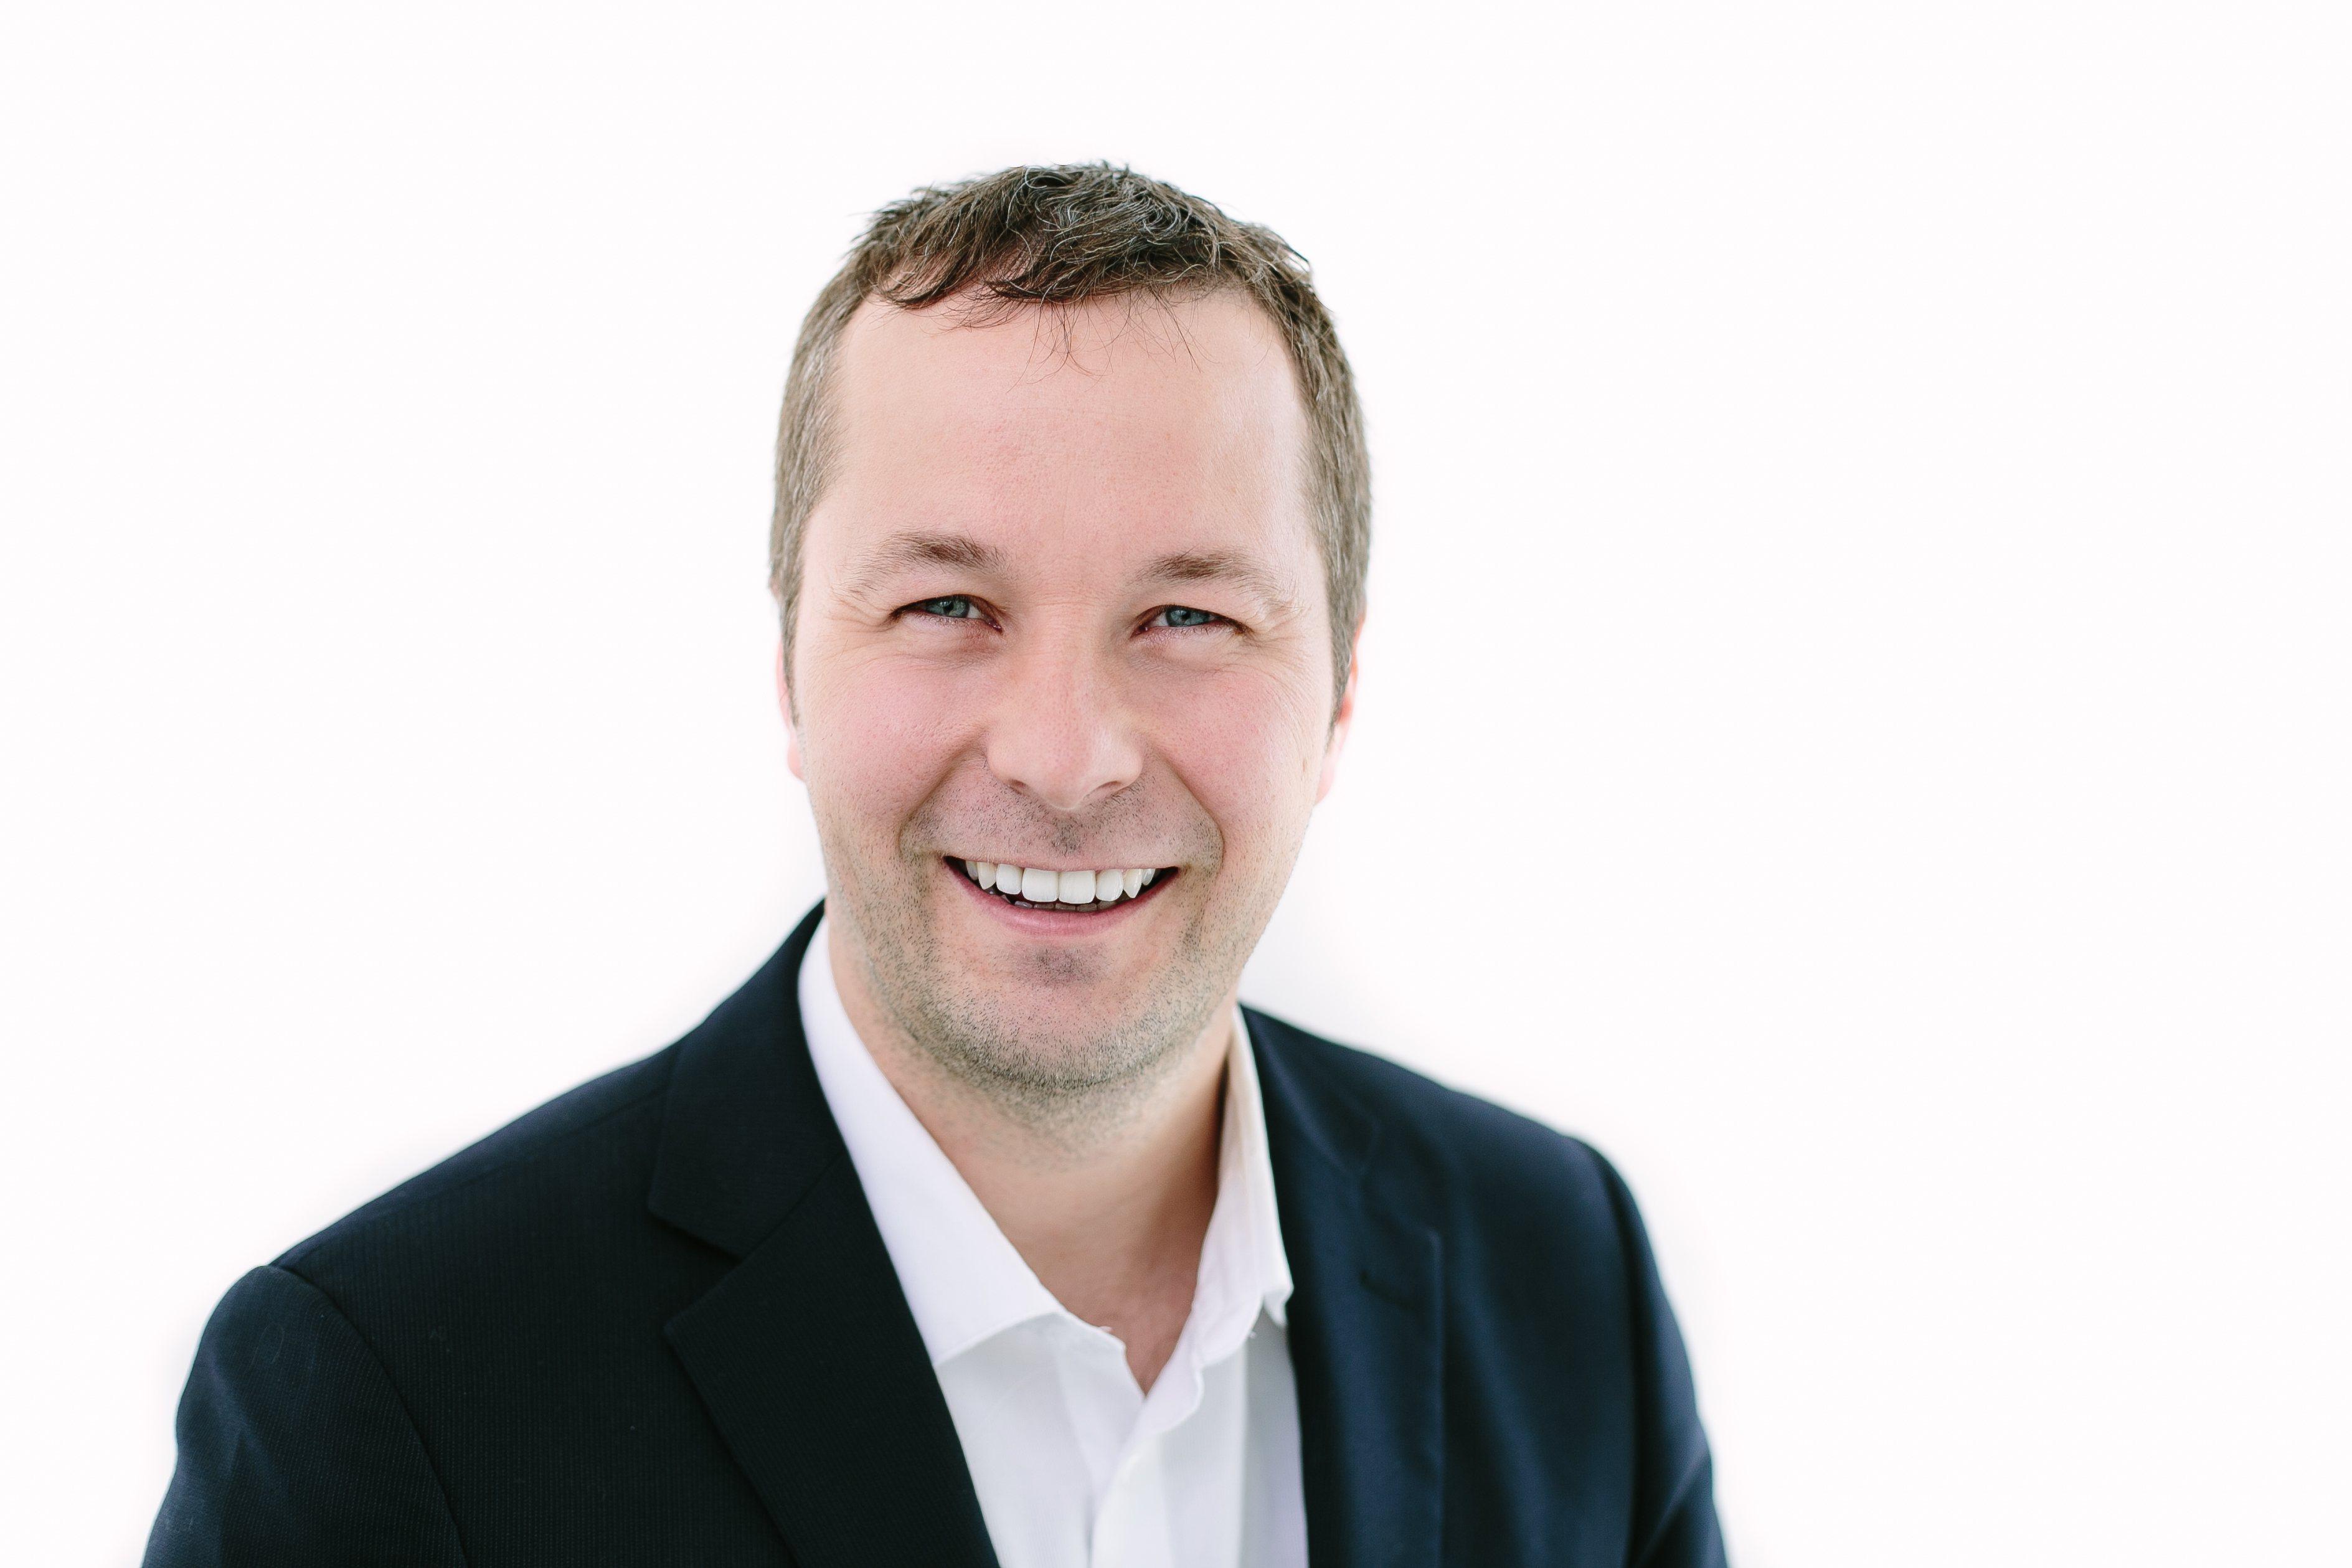 PCRM's fertility doctor, Dr. Jon Havelock